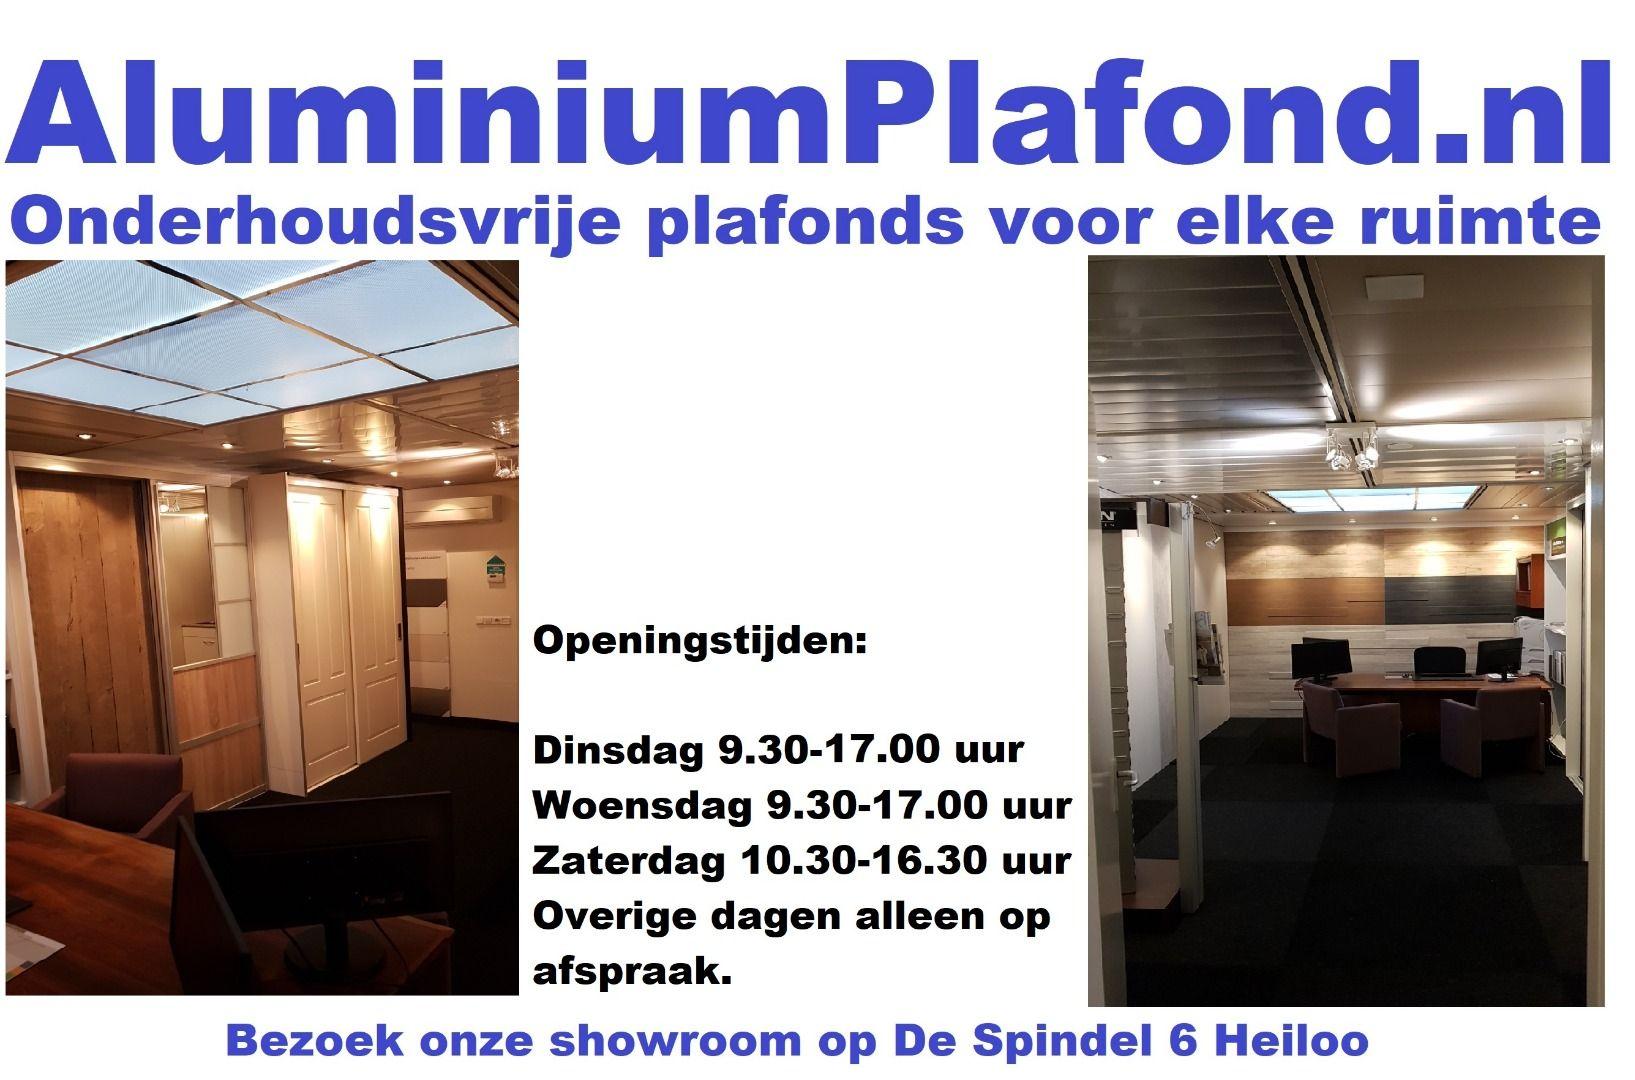 AluminiumPlafond.nl